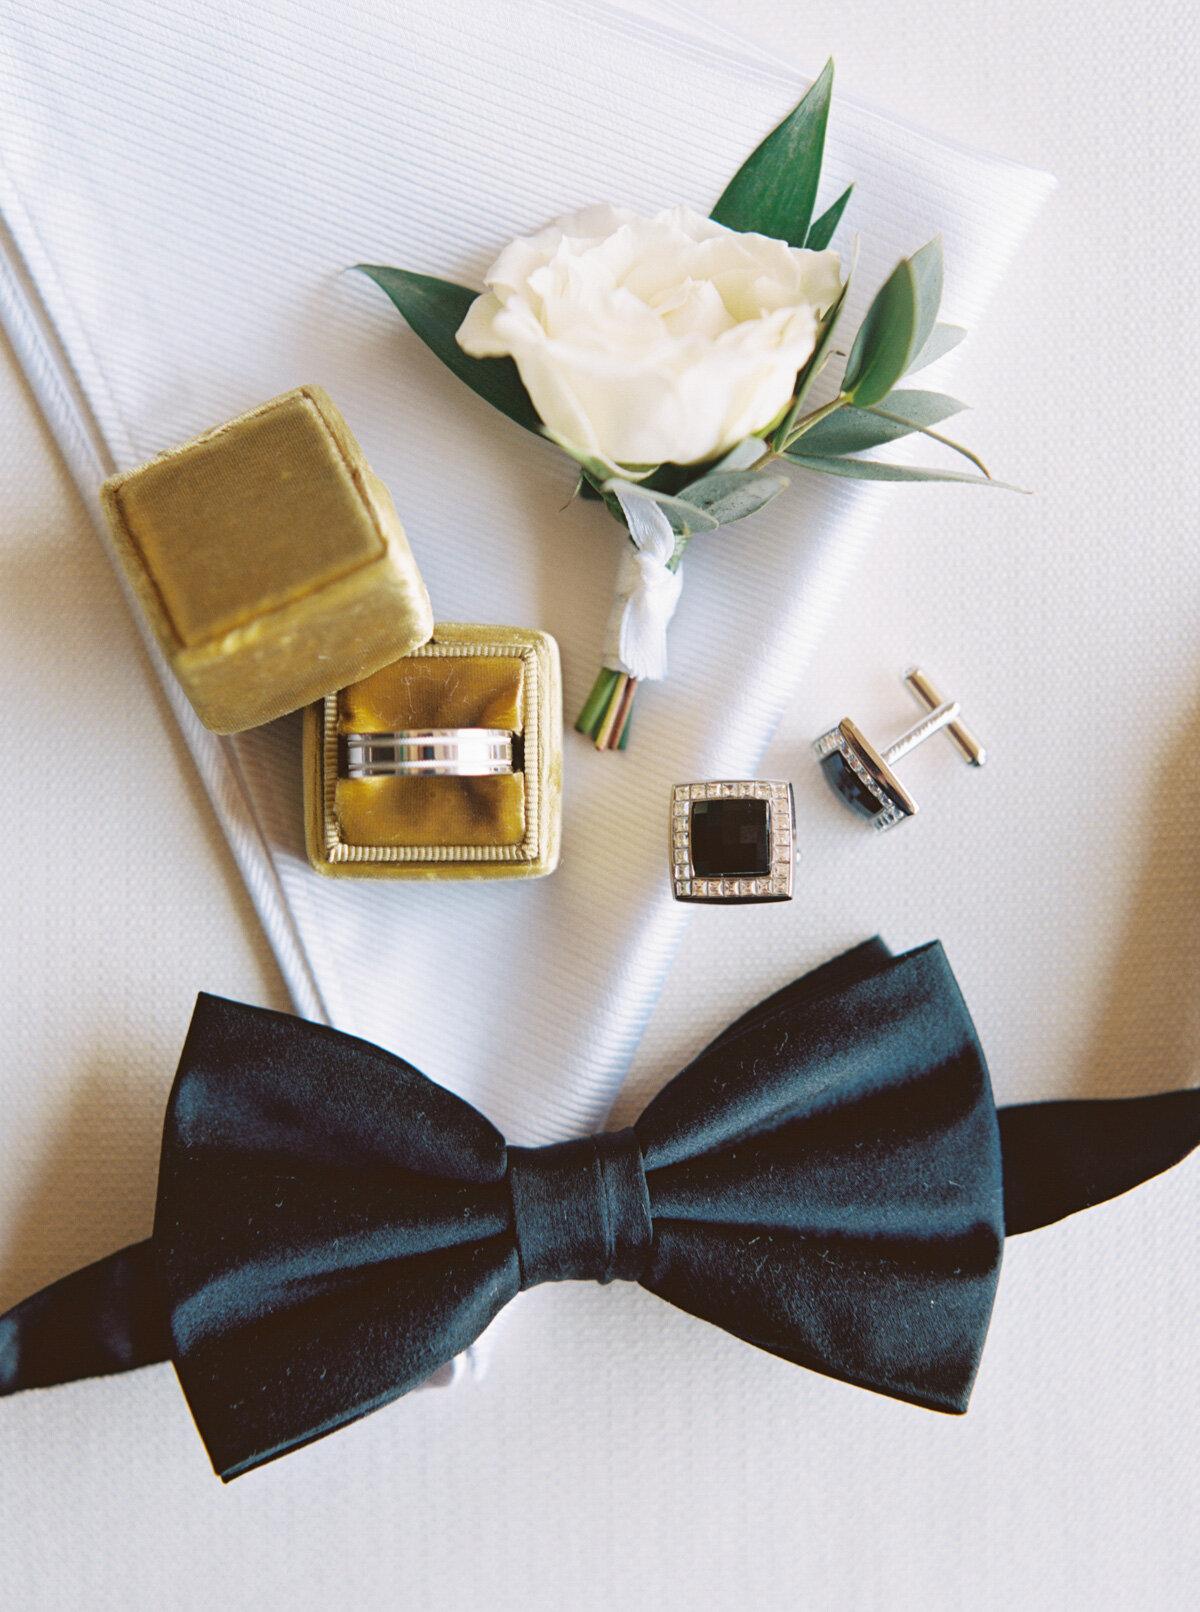 Belmond-Hotel-Caruso-ravello-elopement-Katie-Grant-destination-wedding (5 of 50).jpg